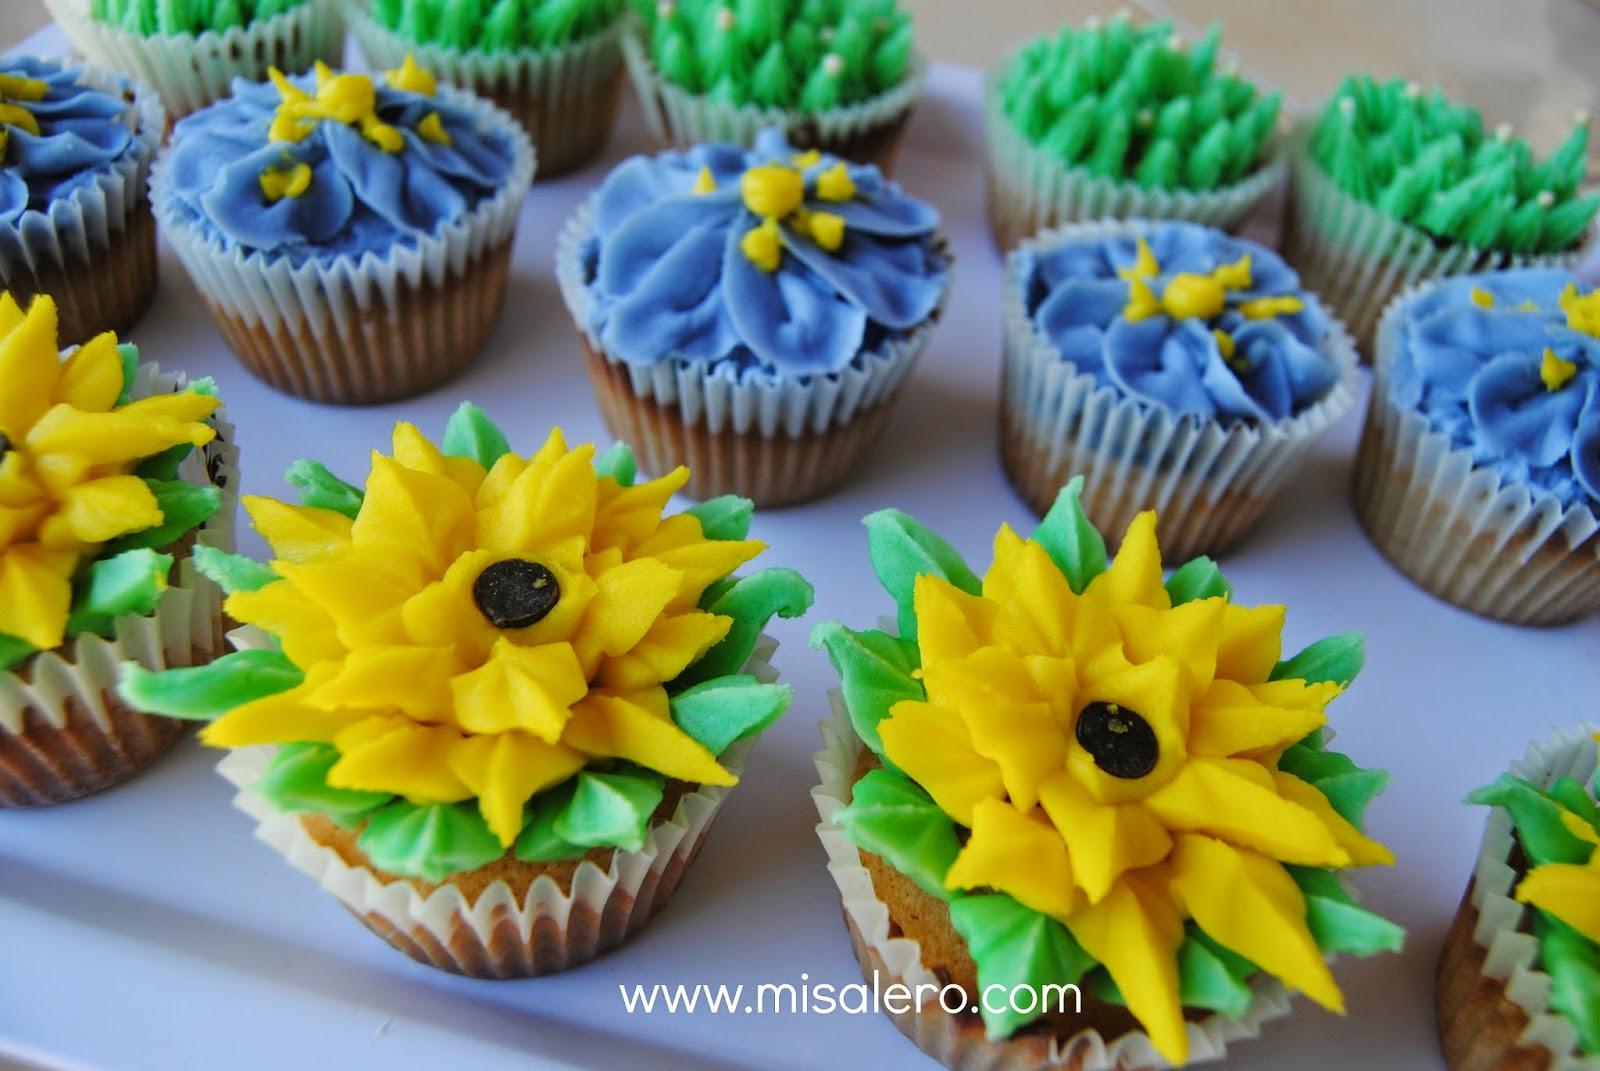 http://www.misalero.es/2014/12/cupcakes-de-vainilla-de-peggy-porshen.html